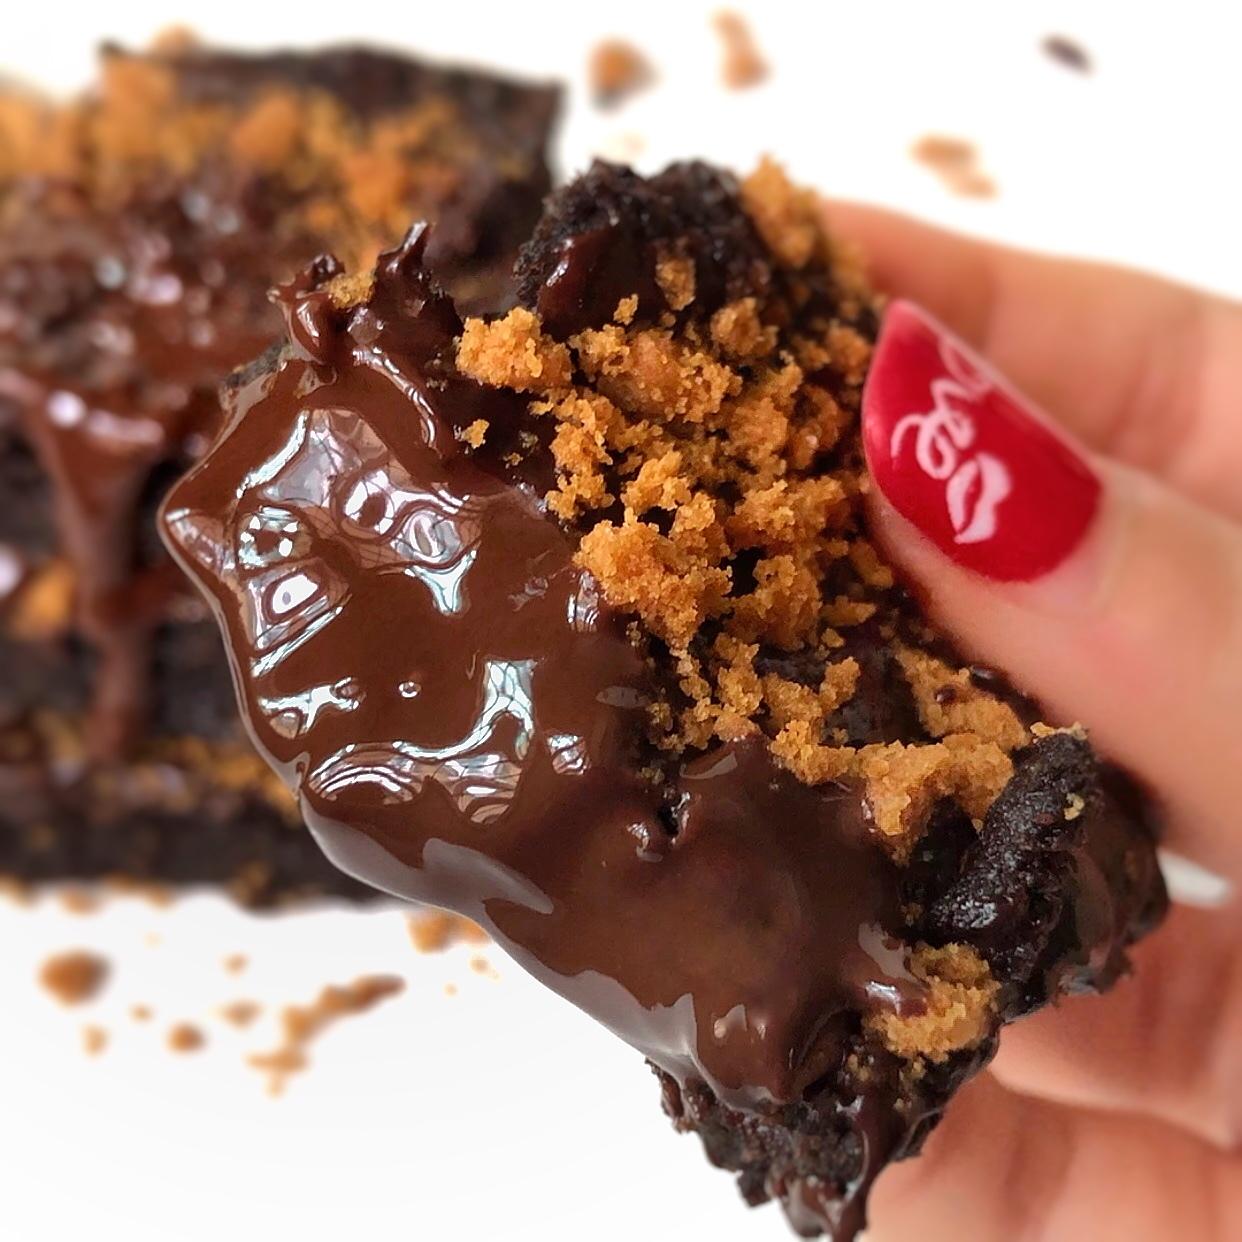 How to make Vegan gluten free brownies